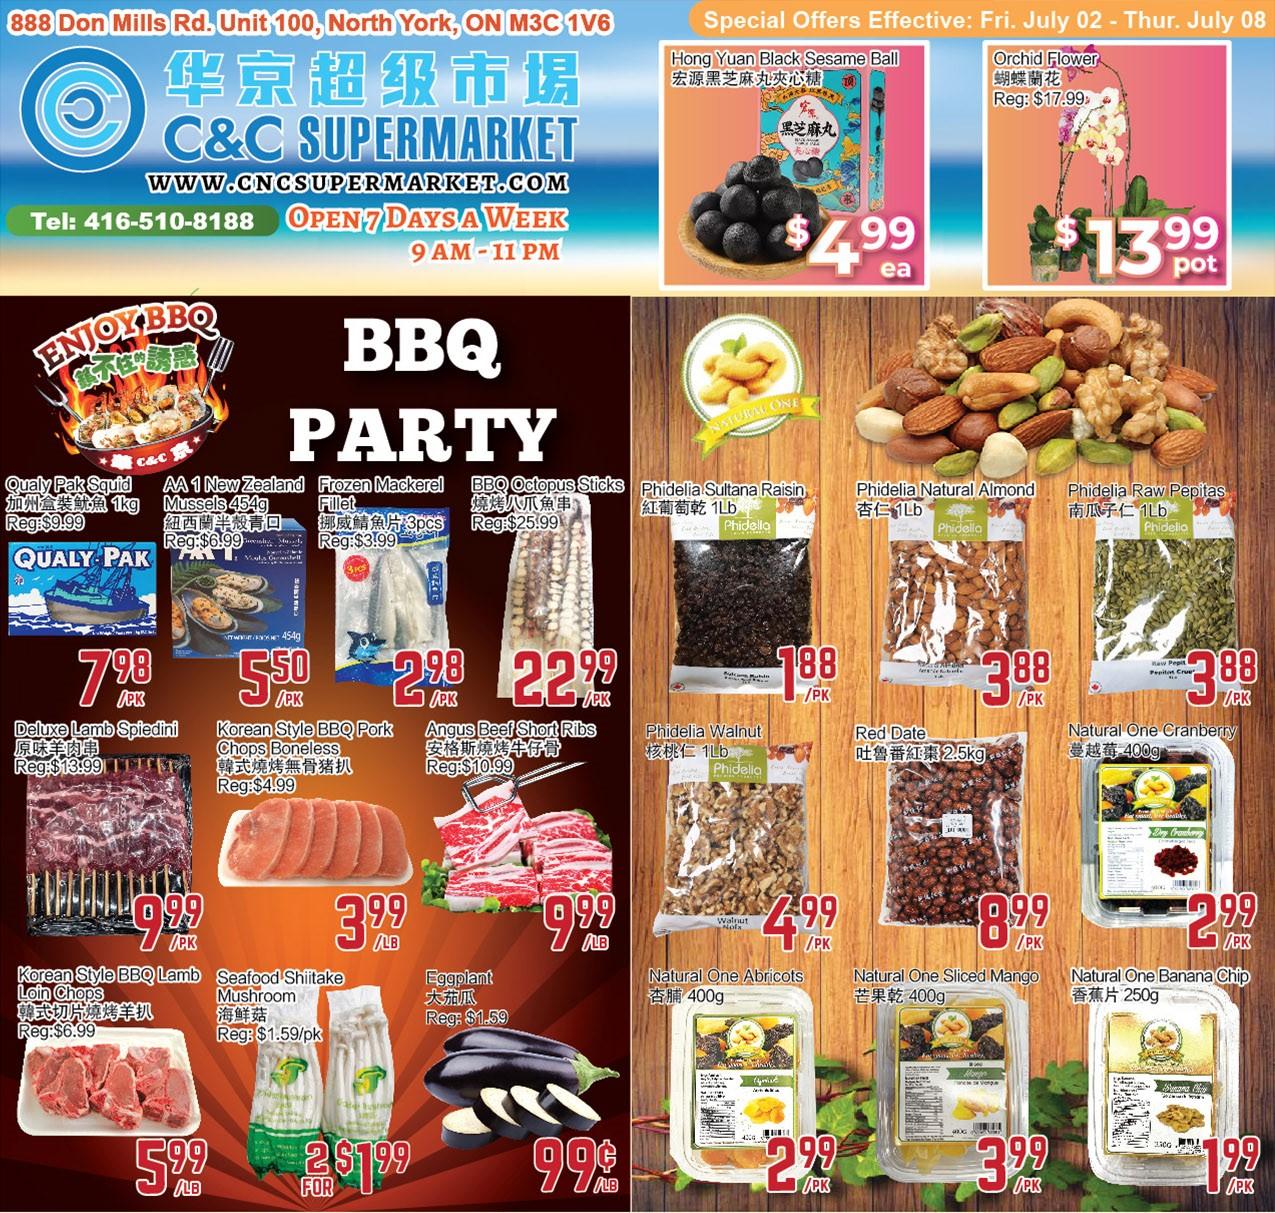 C&C Supermarket Flyer | Jul 2